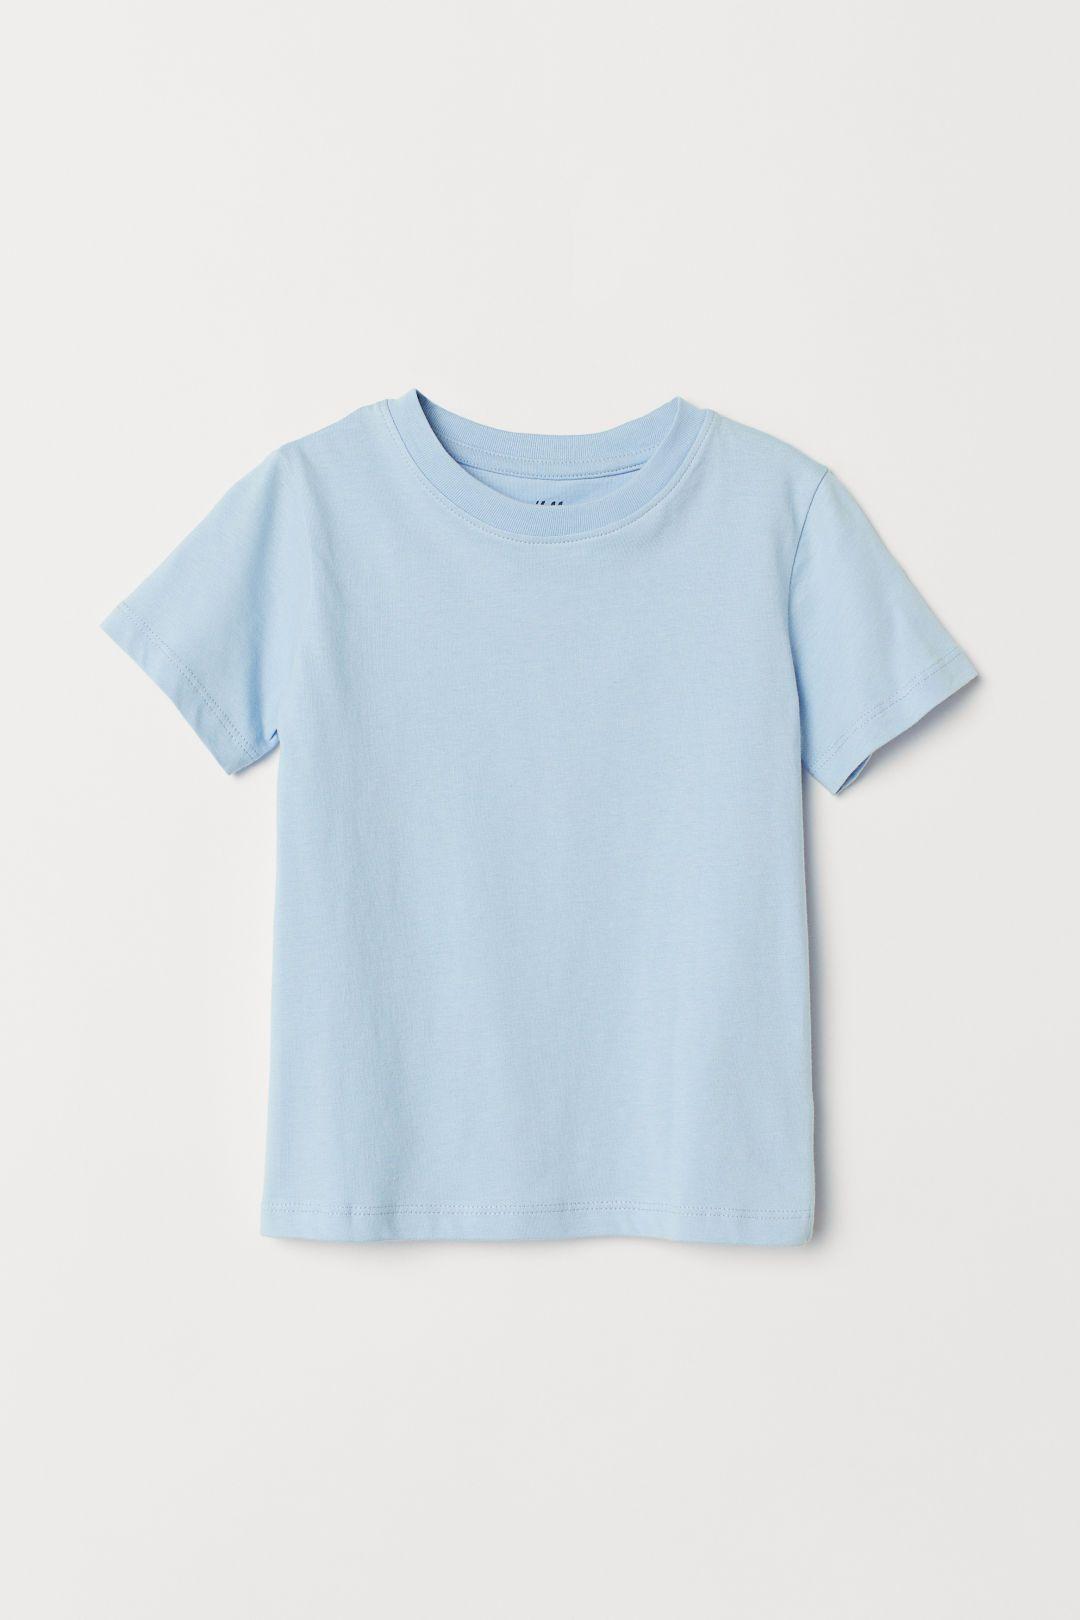 Cotton T Shirt Khaki Green Kids H M Us Cotton Tshirt Plain Tee Shirts Simple Shirts